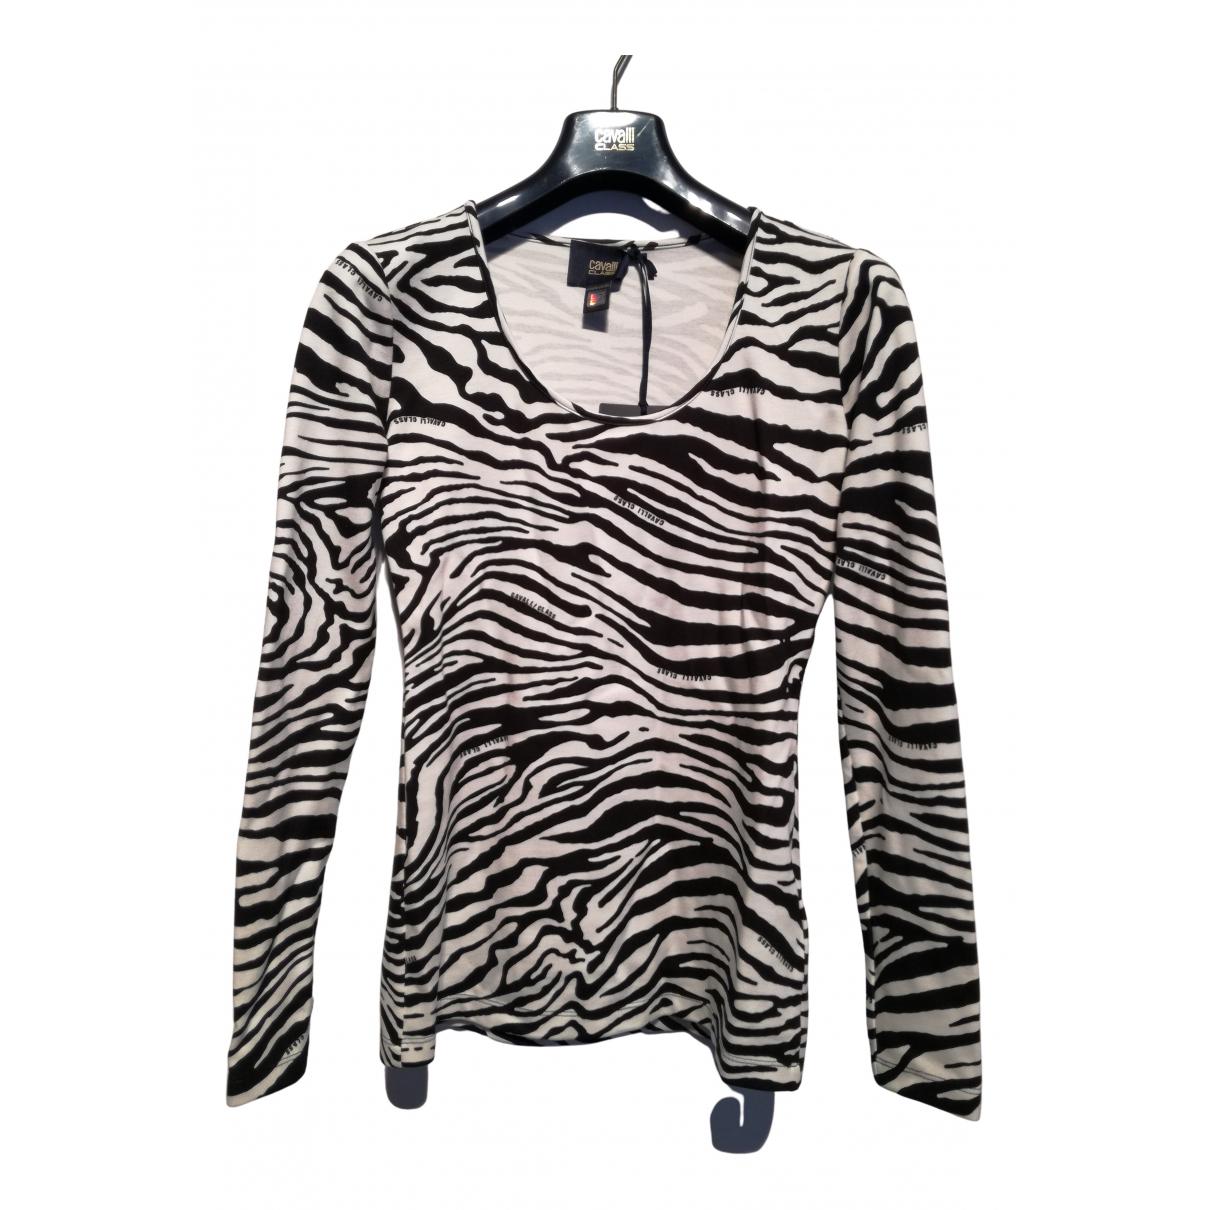 Roberto Cavalli N Multicolour Cotton  top for Women XS International